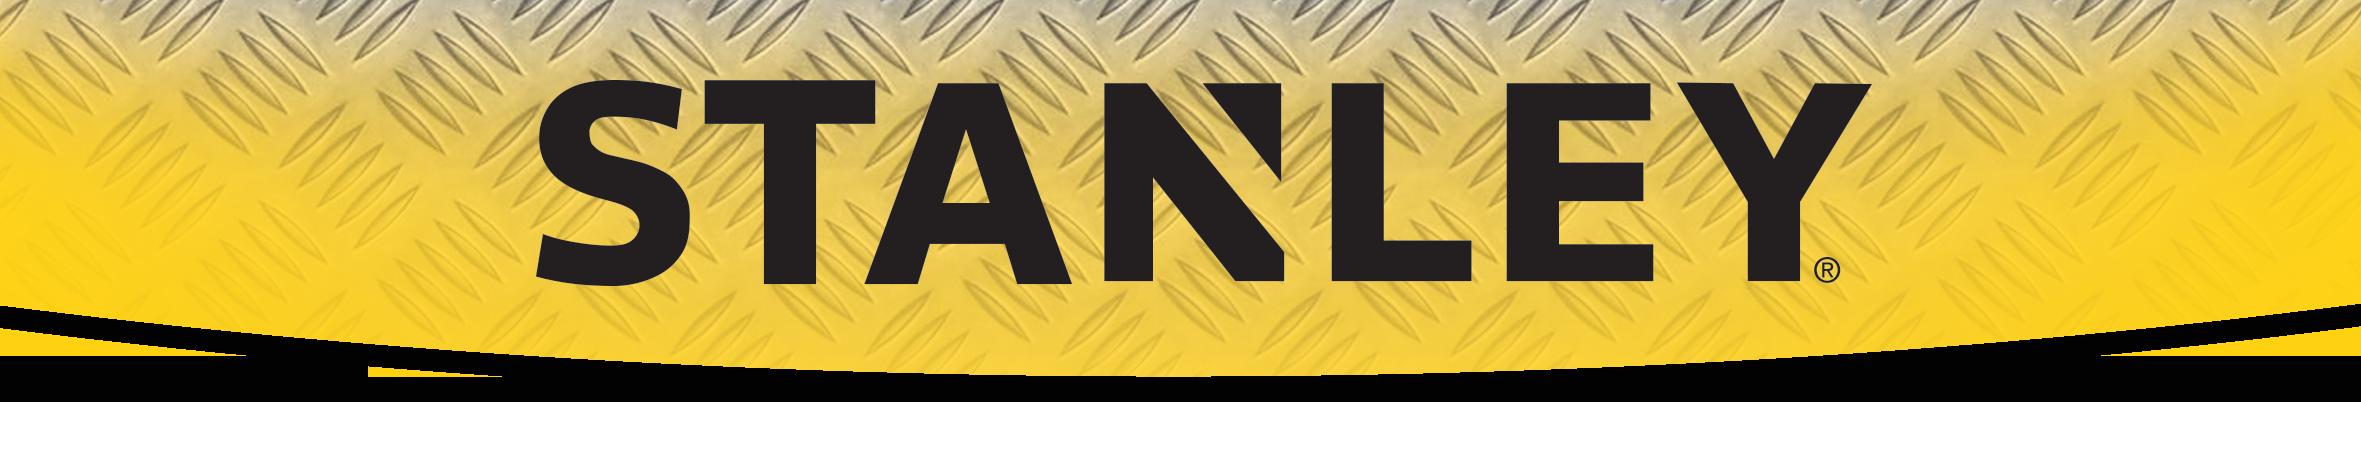 banner-page-header-master.png